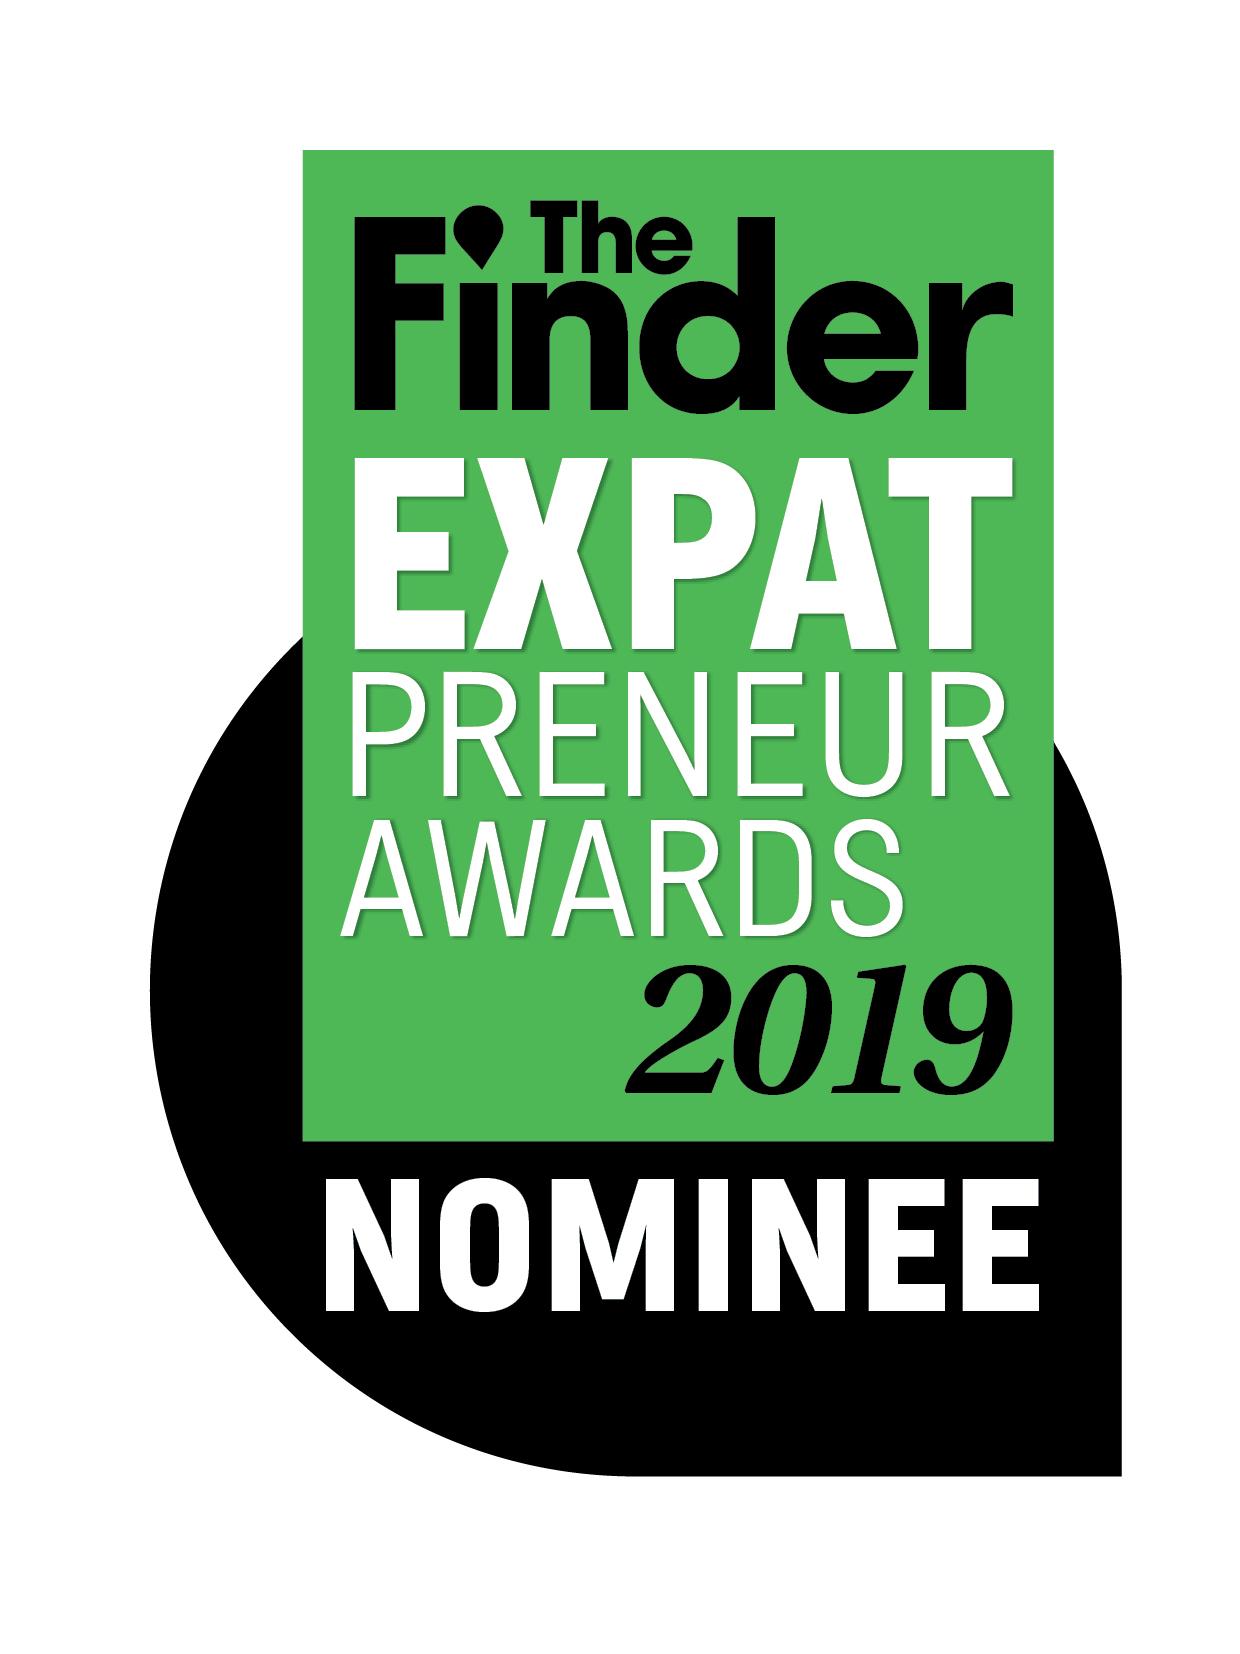 The Finder Expat Preneur Awards 2019 - Nominee